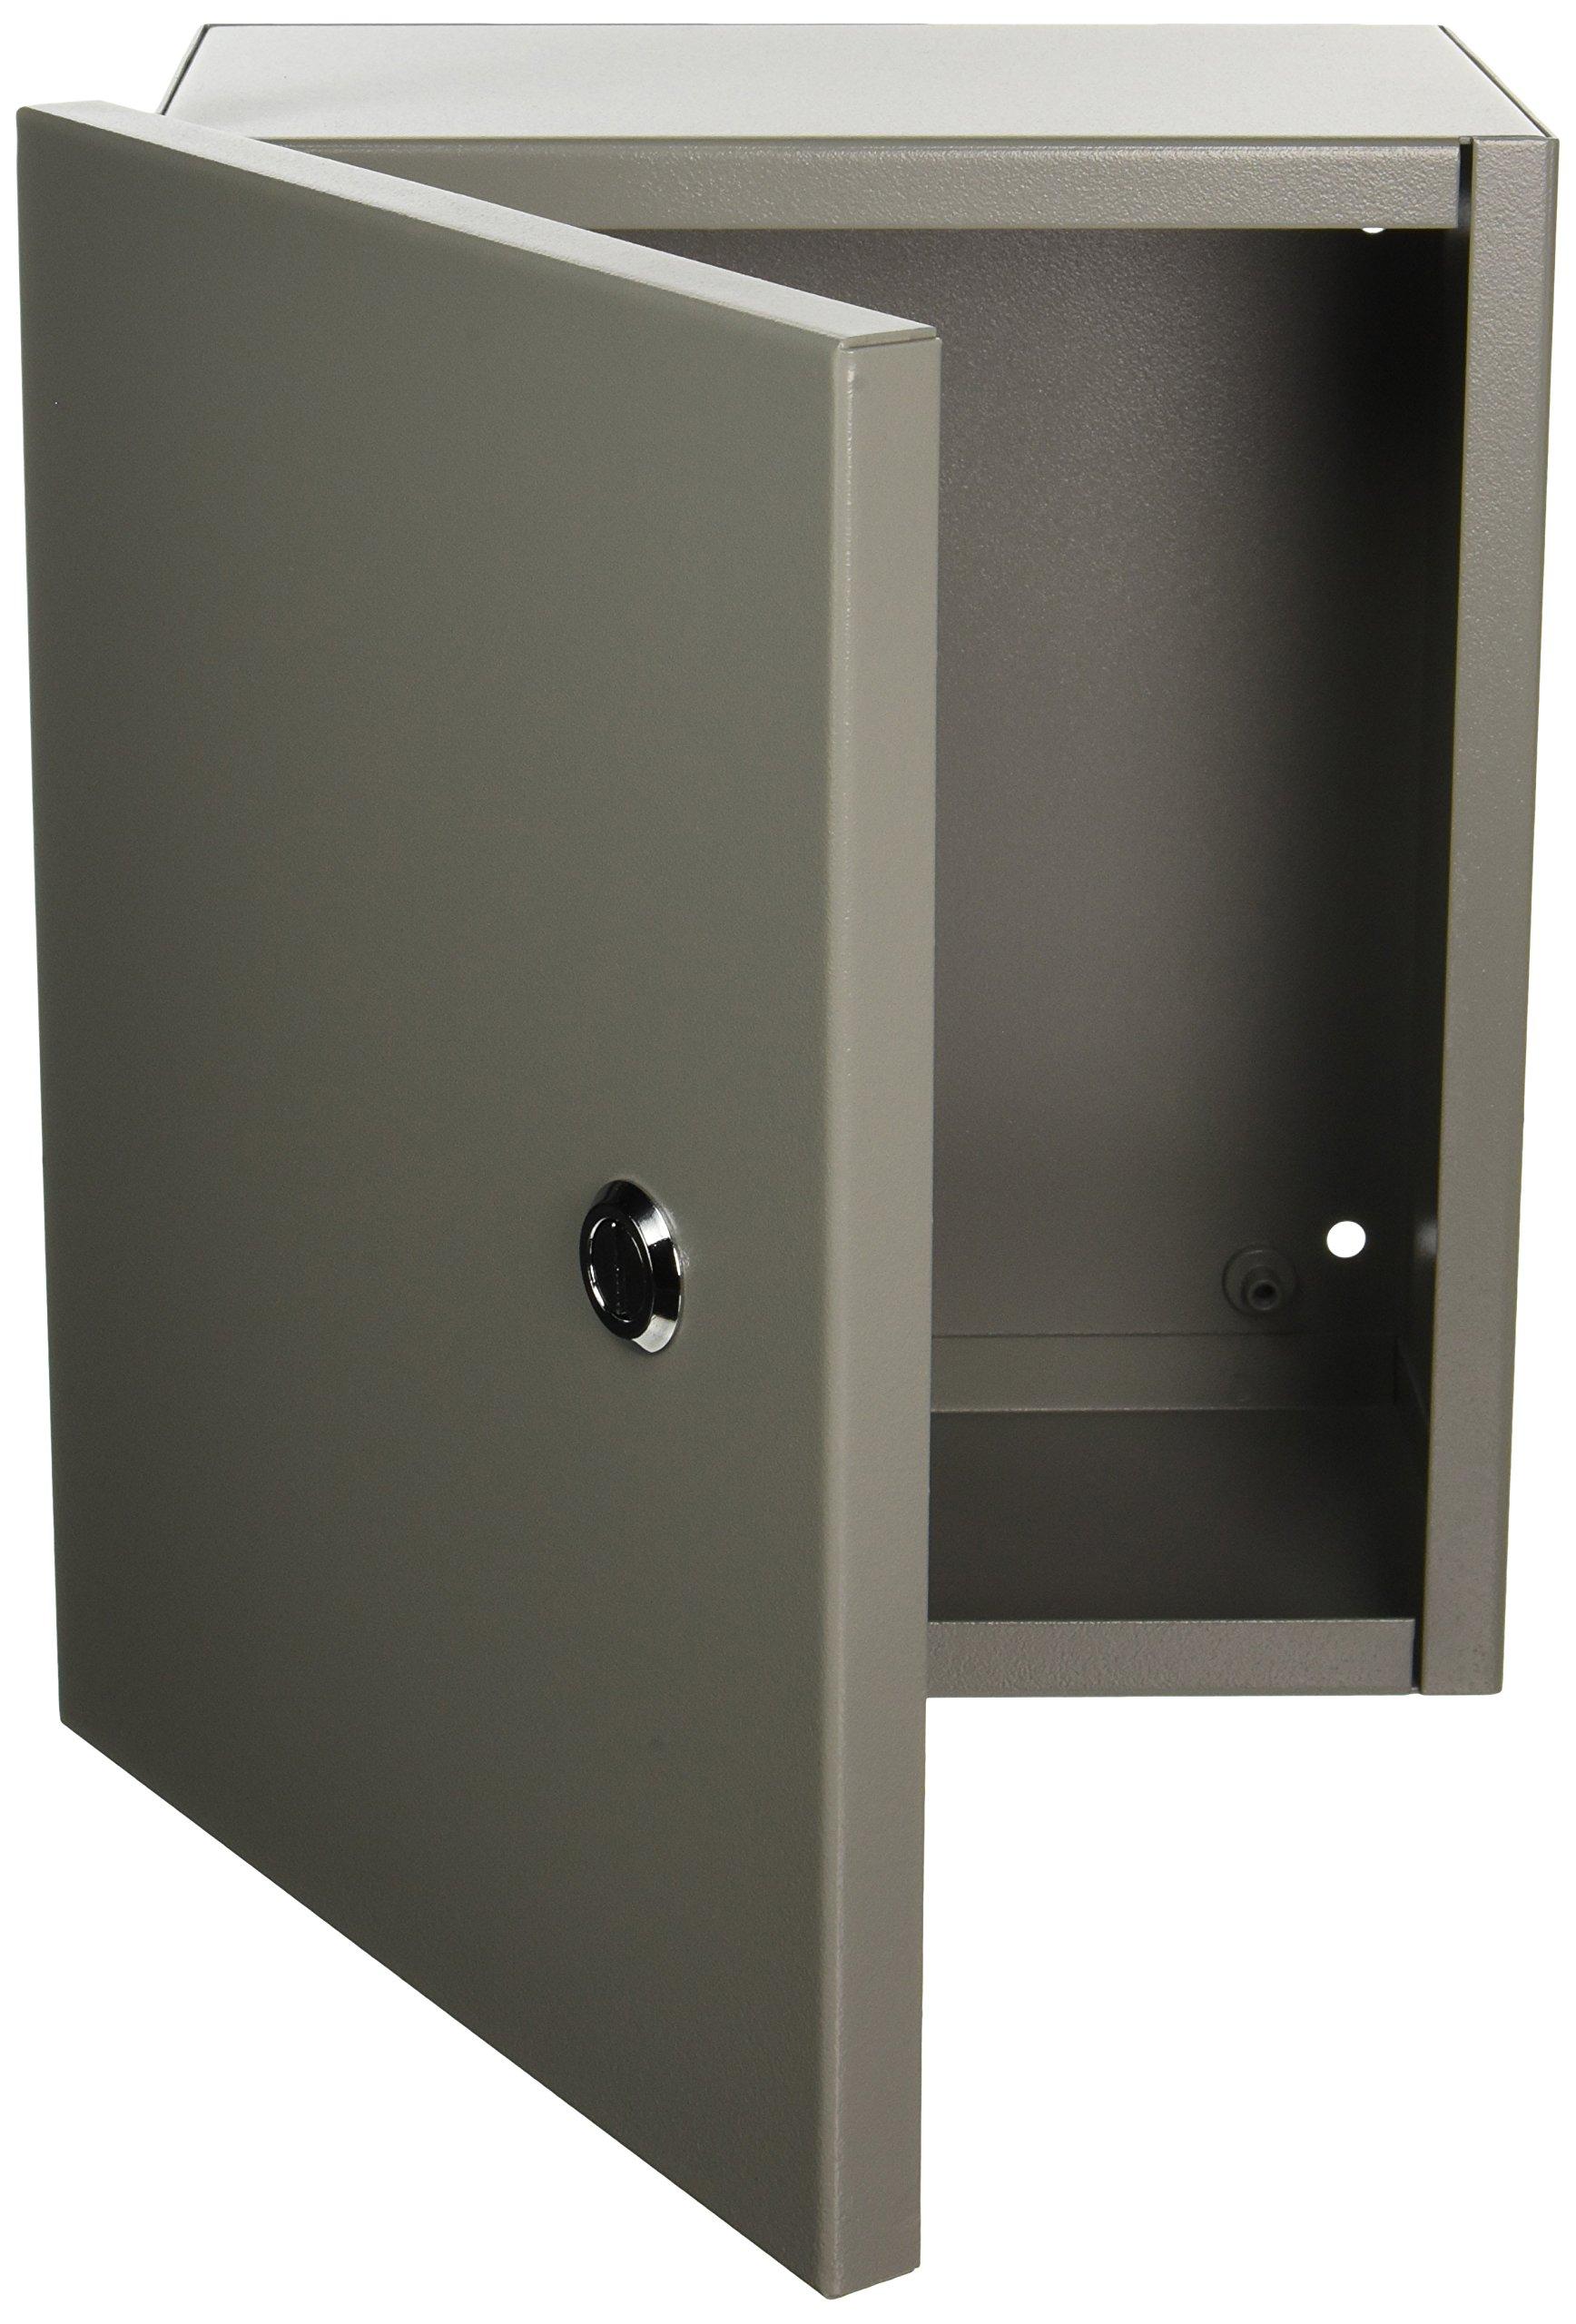 Wiegmann N1C101206 N1C-Series NEMA 1 Small Hinged Cover Wallmount Cabinet, Steel, 12'' x 10'' x 6''